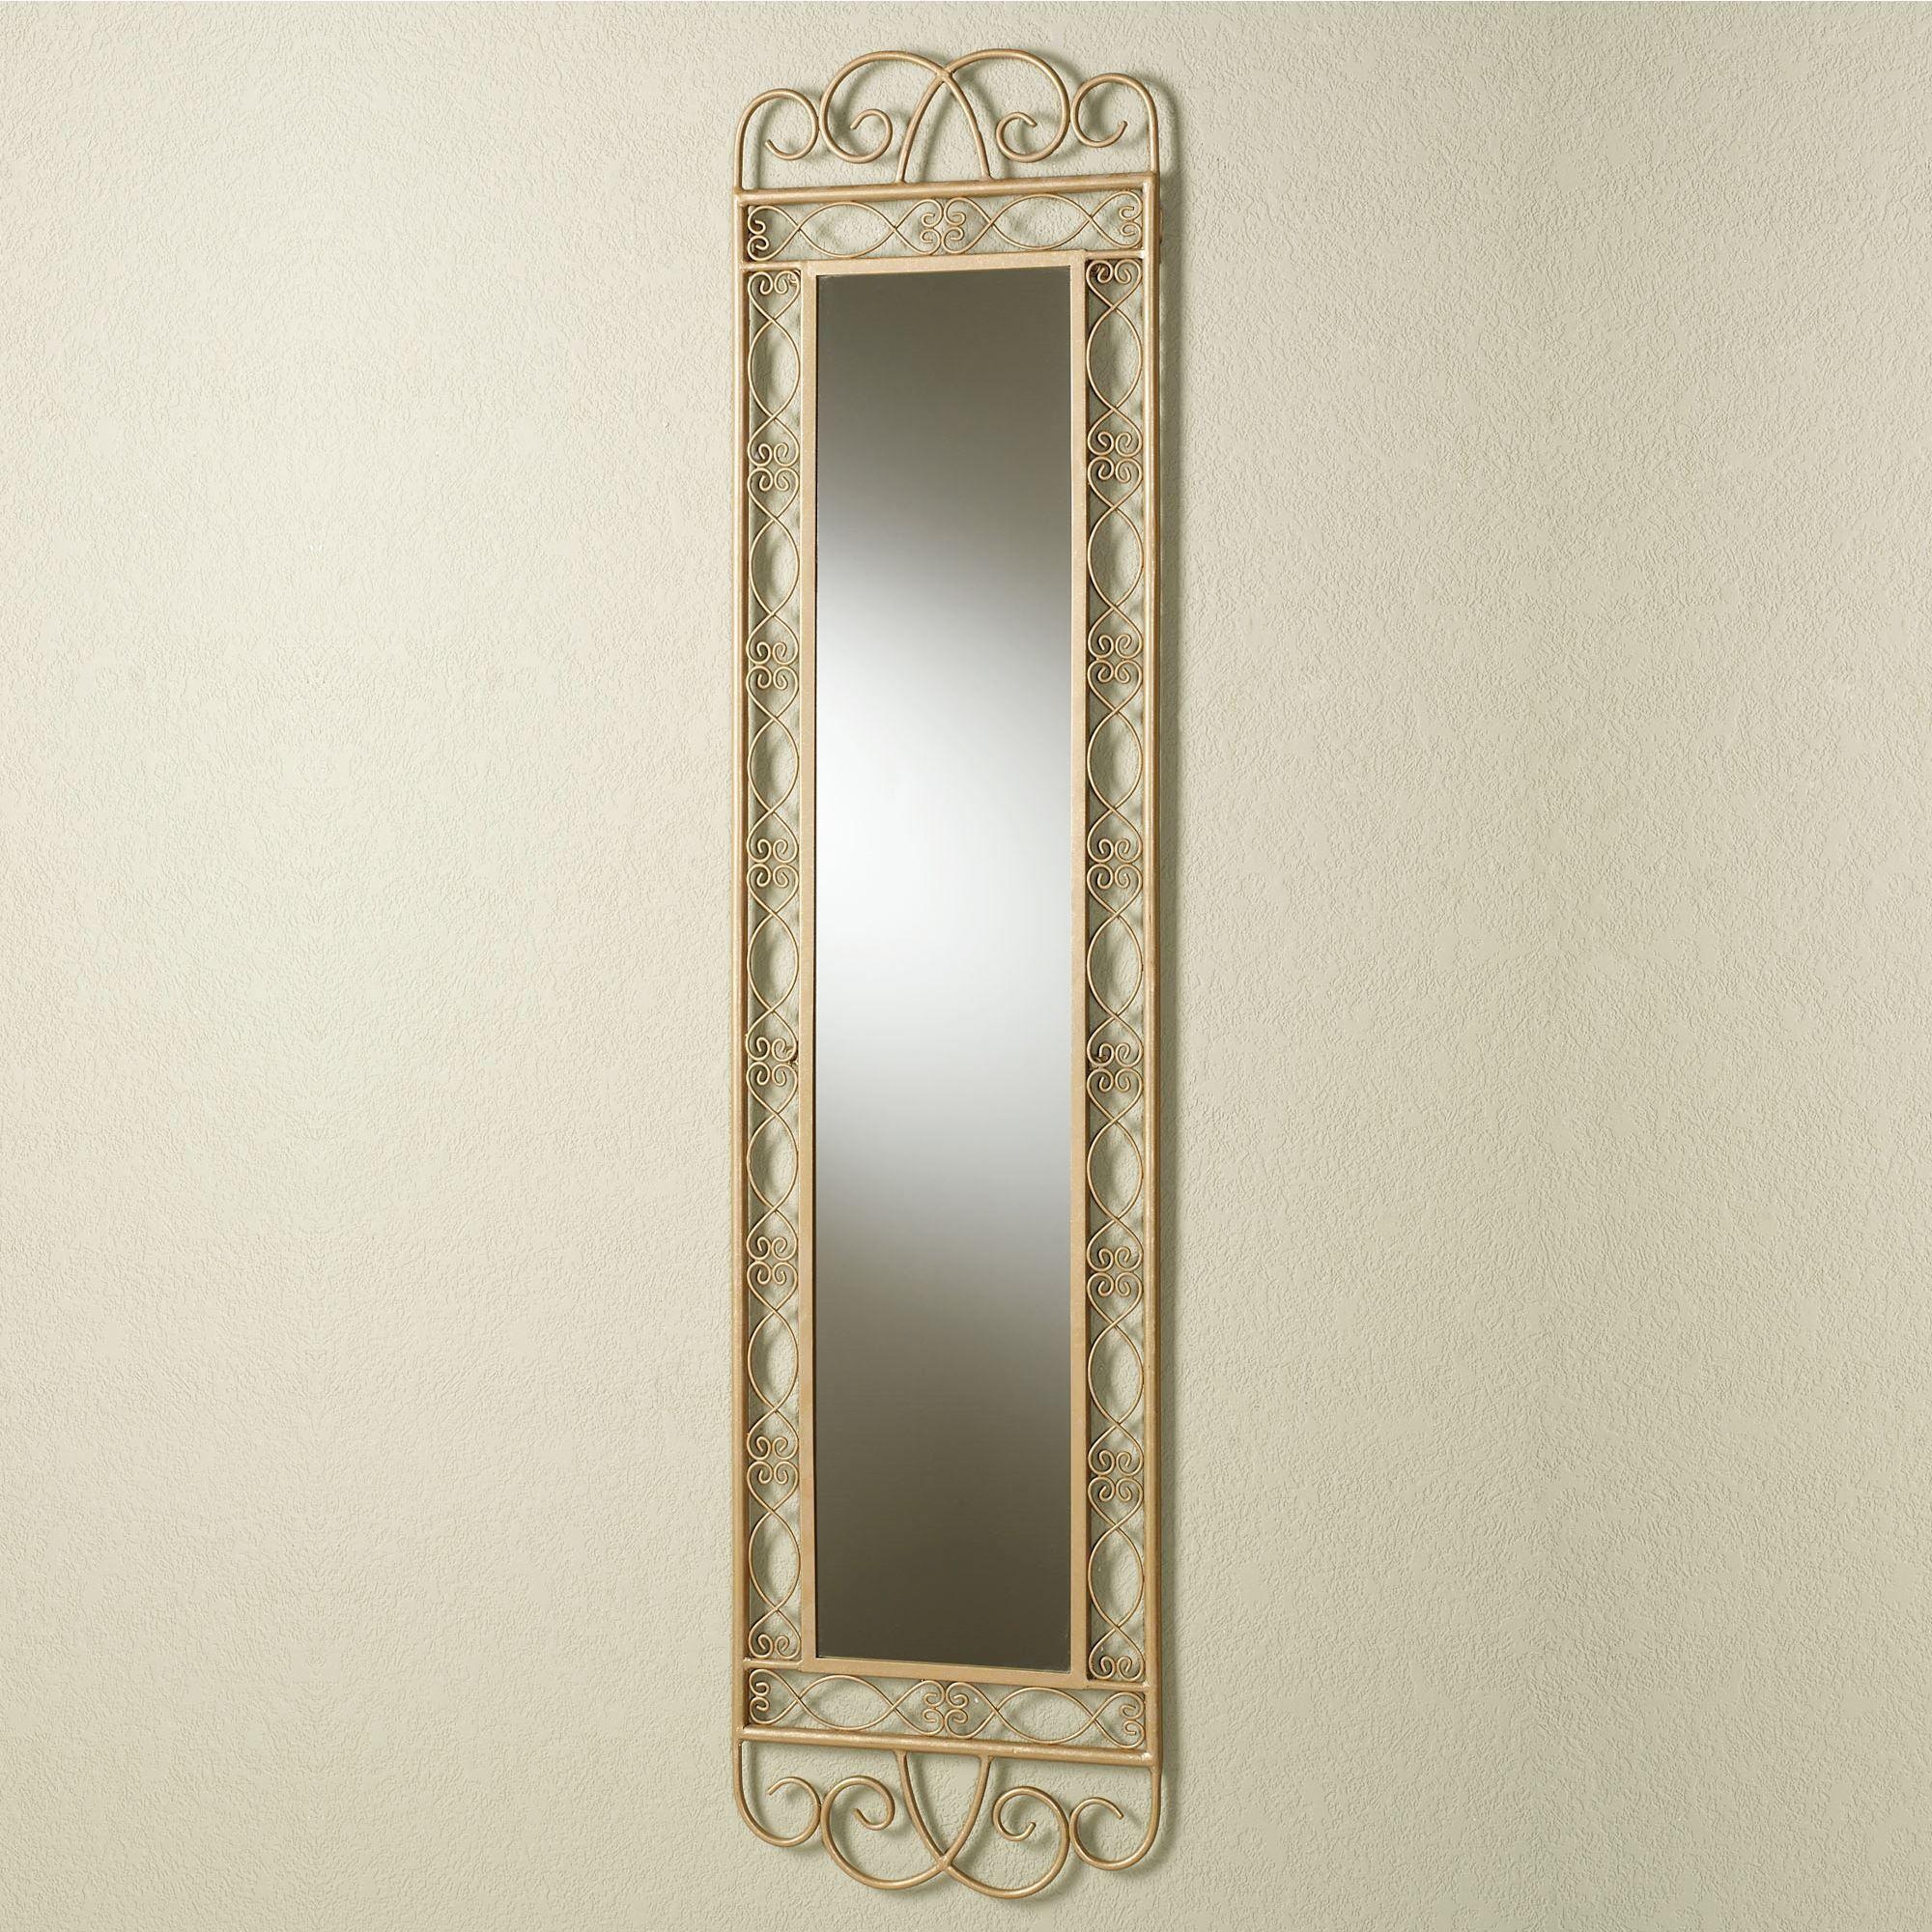 Gianna Wall Mirror Panel